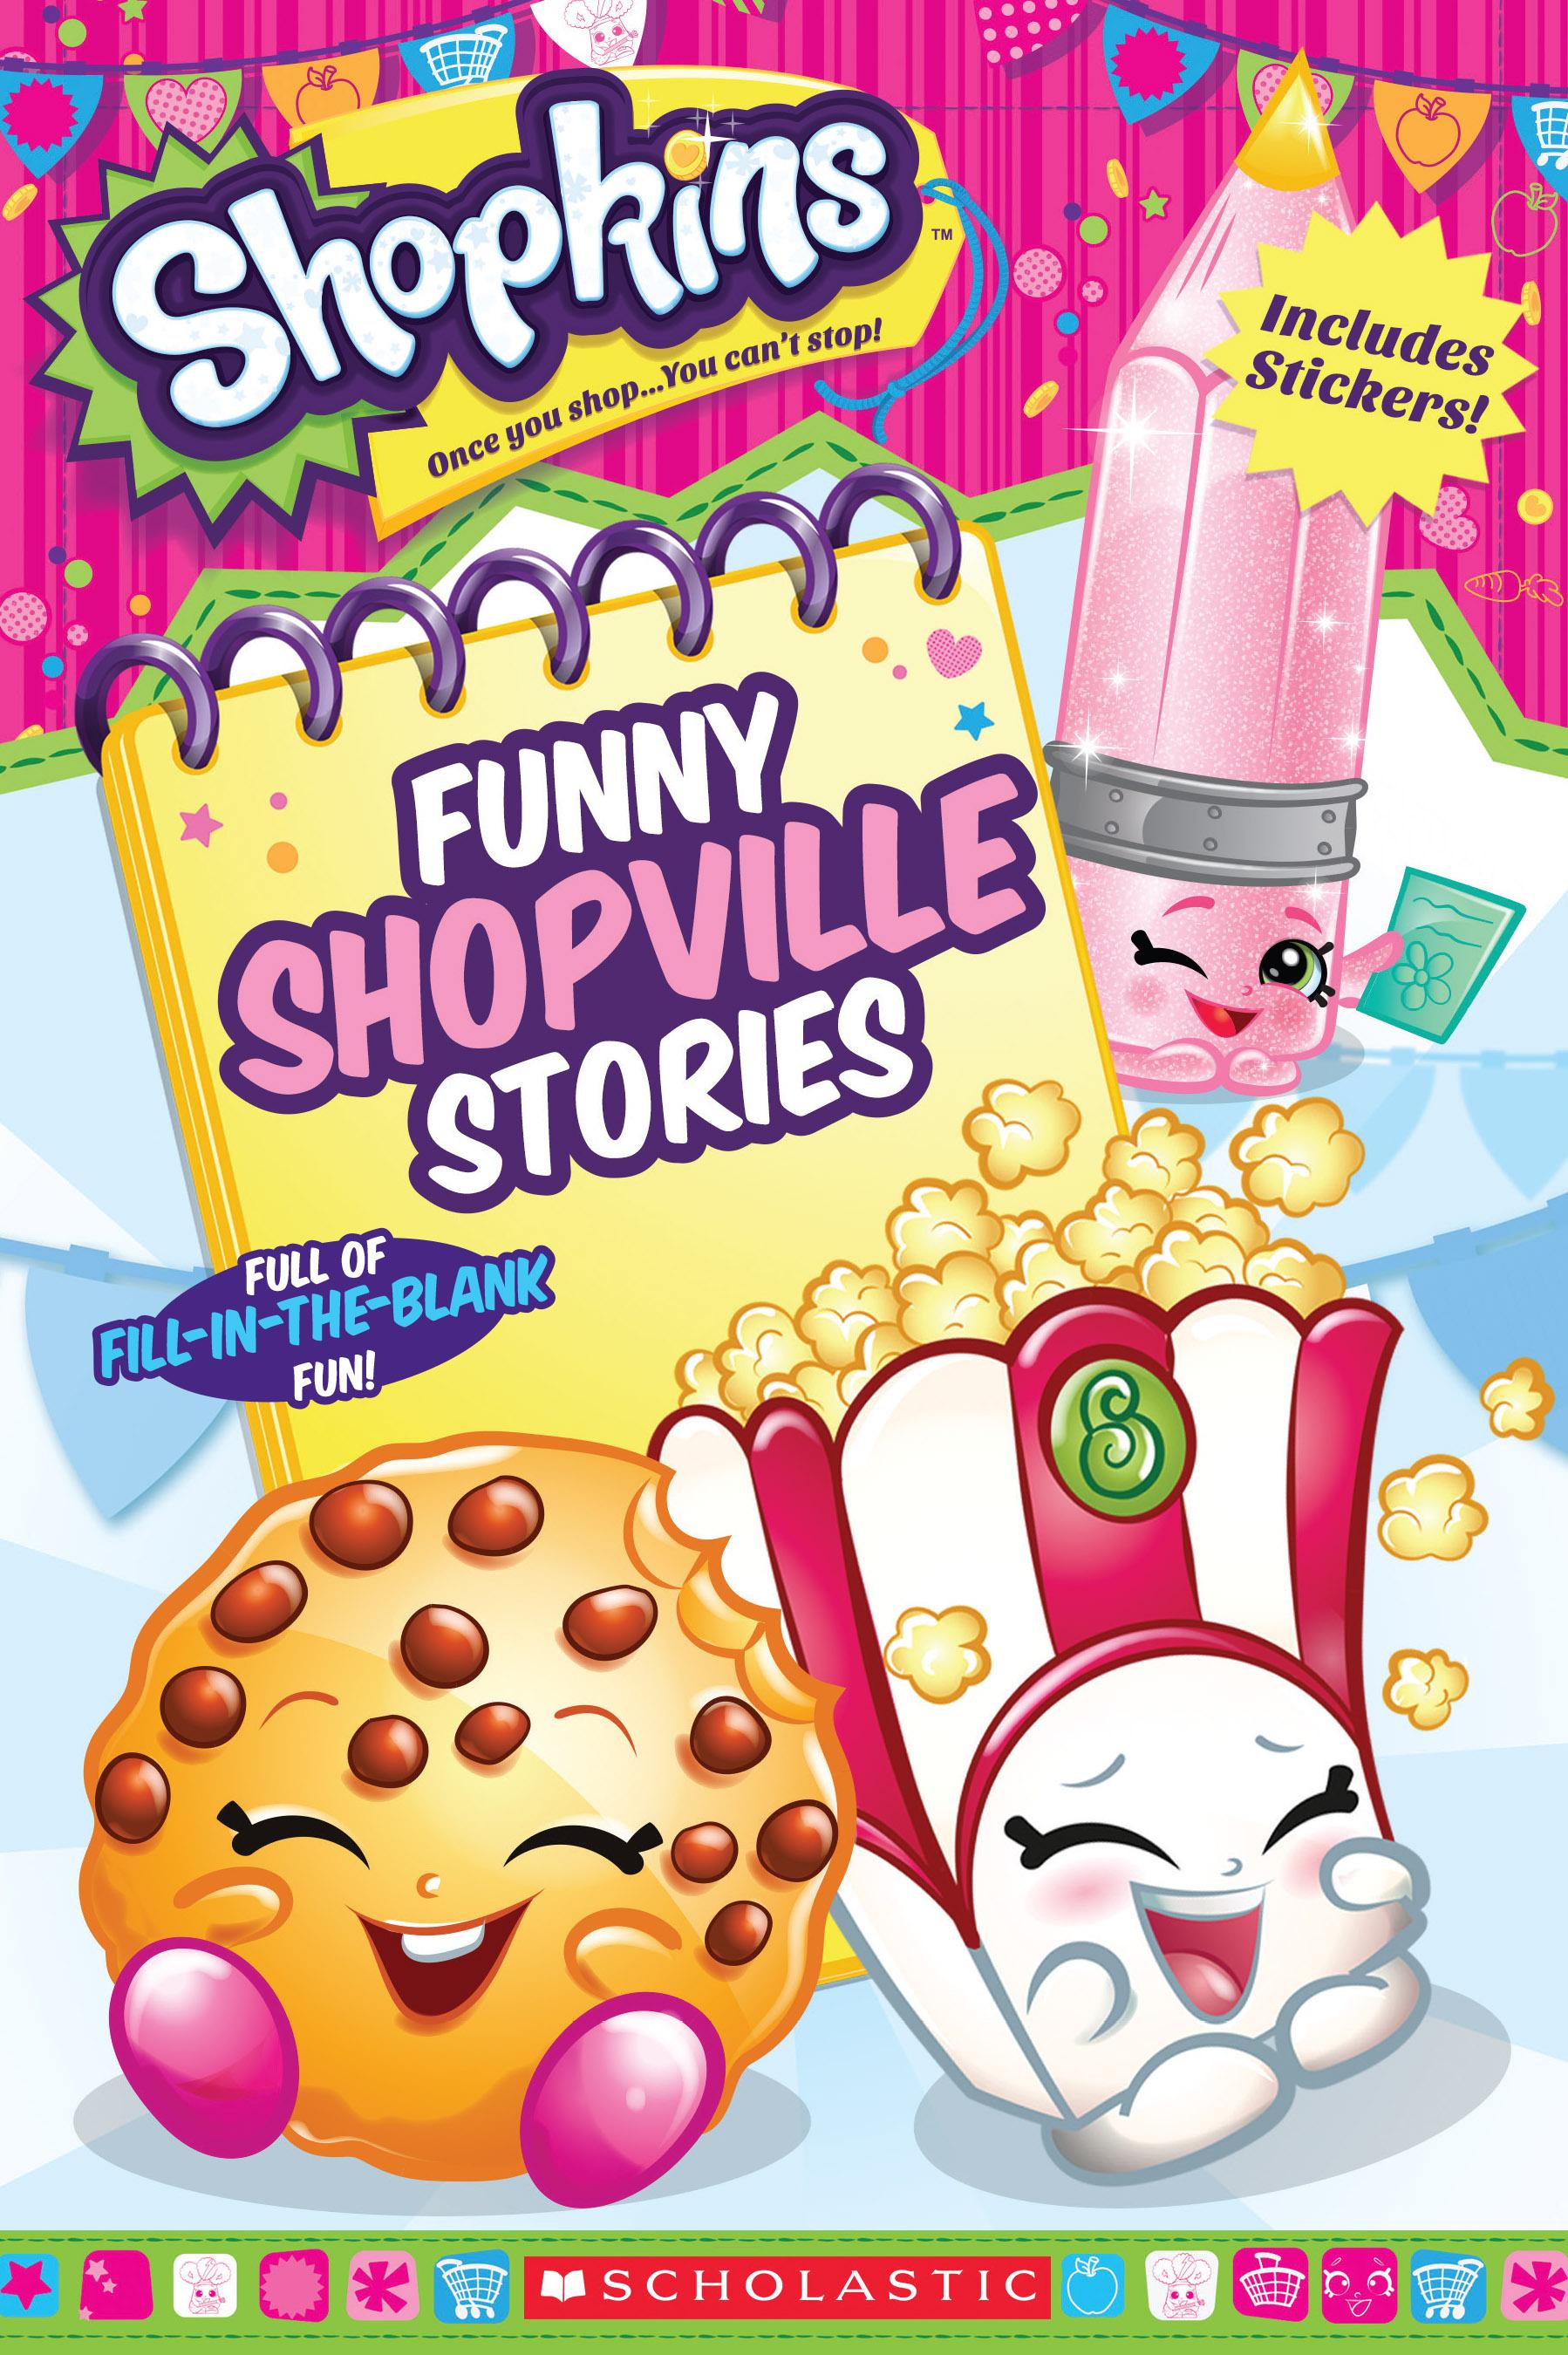 Funny Shopville Stories (Shopkins)